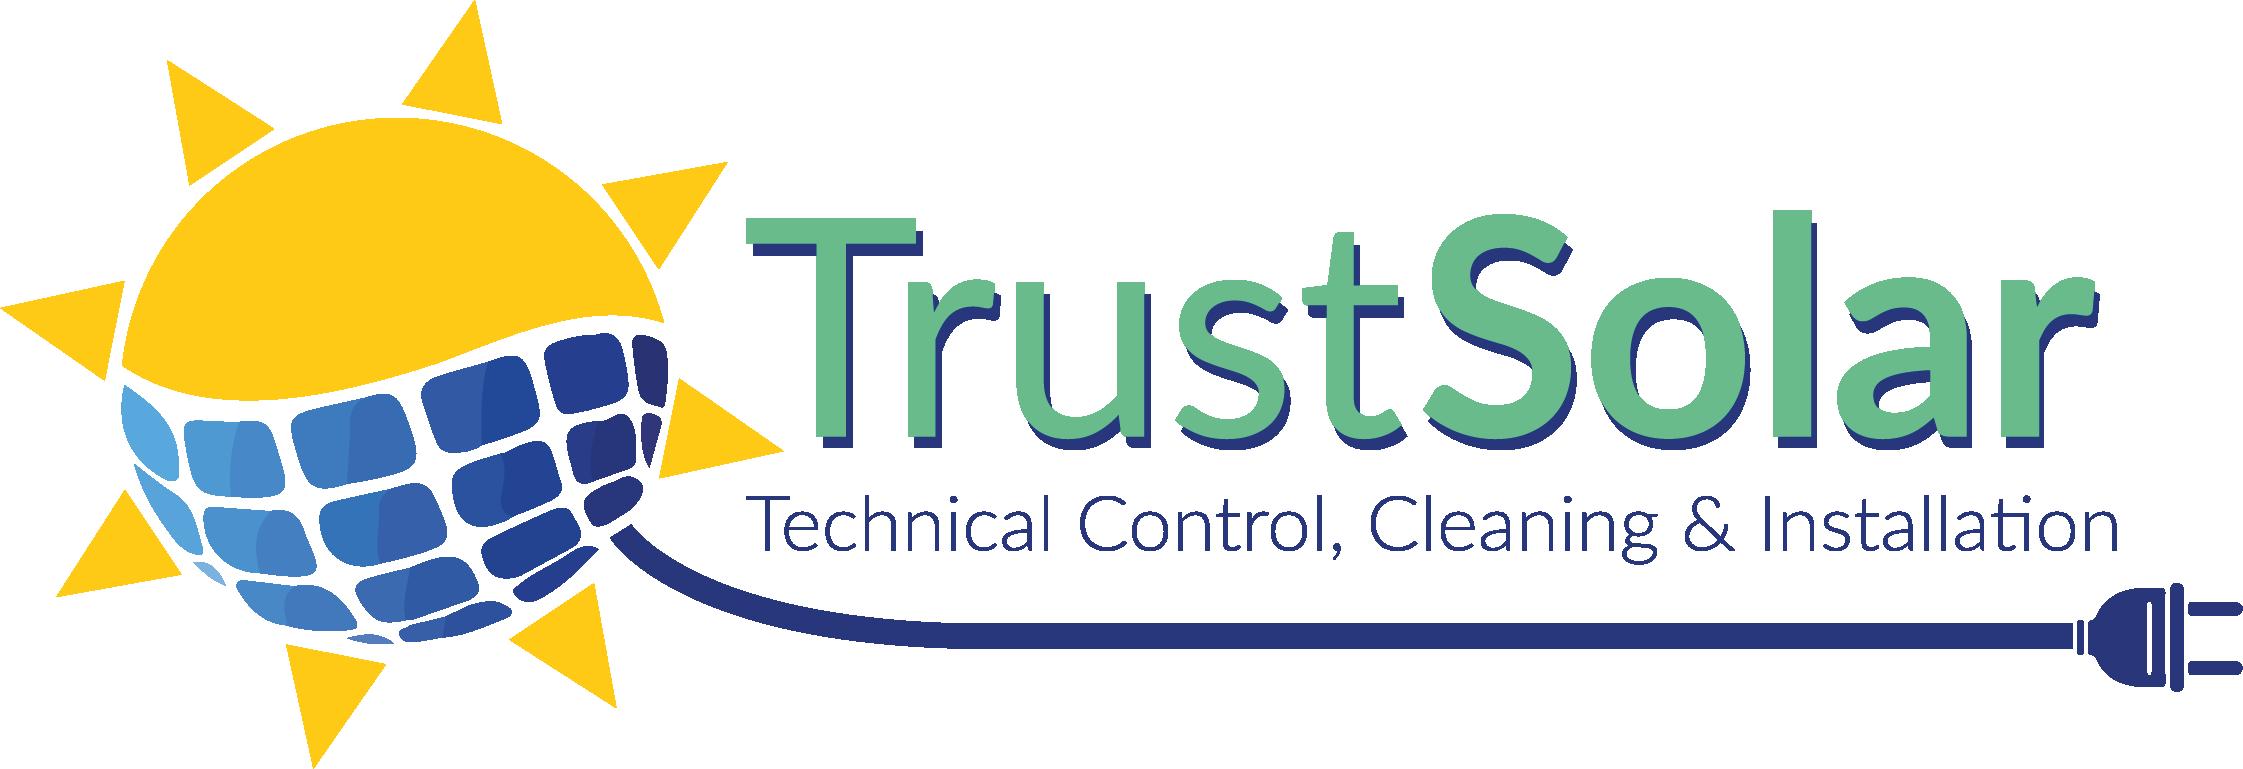 Trustsolar